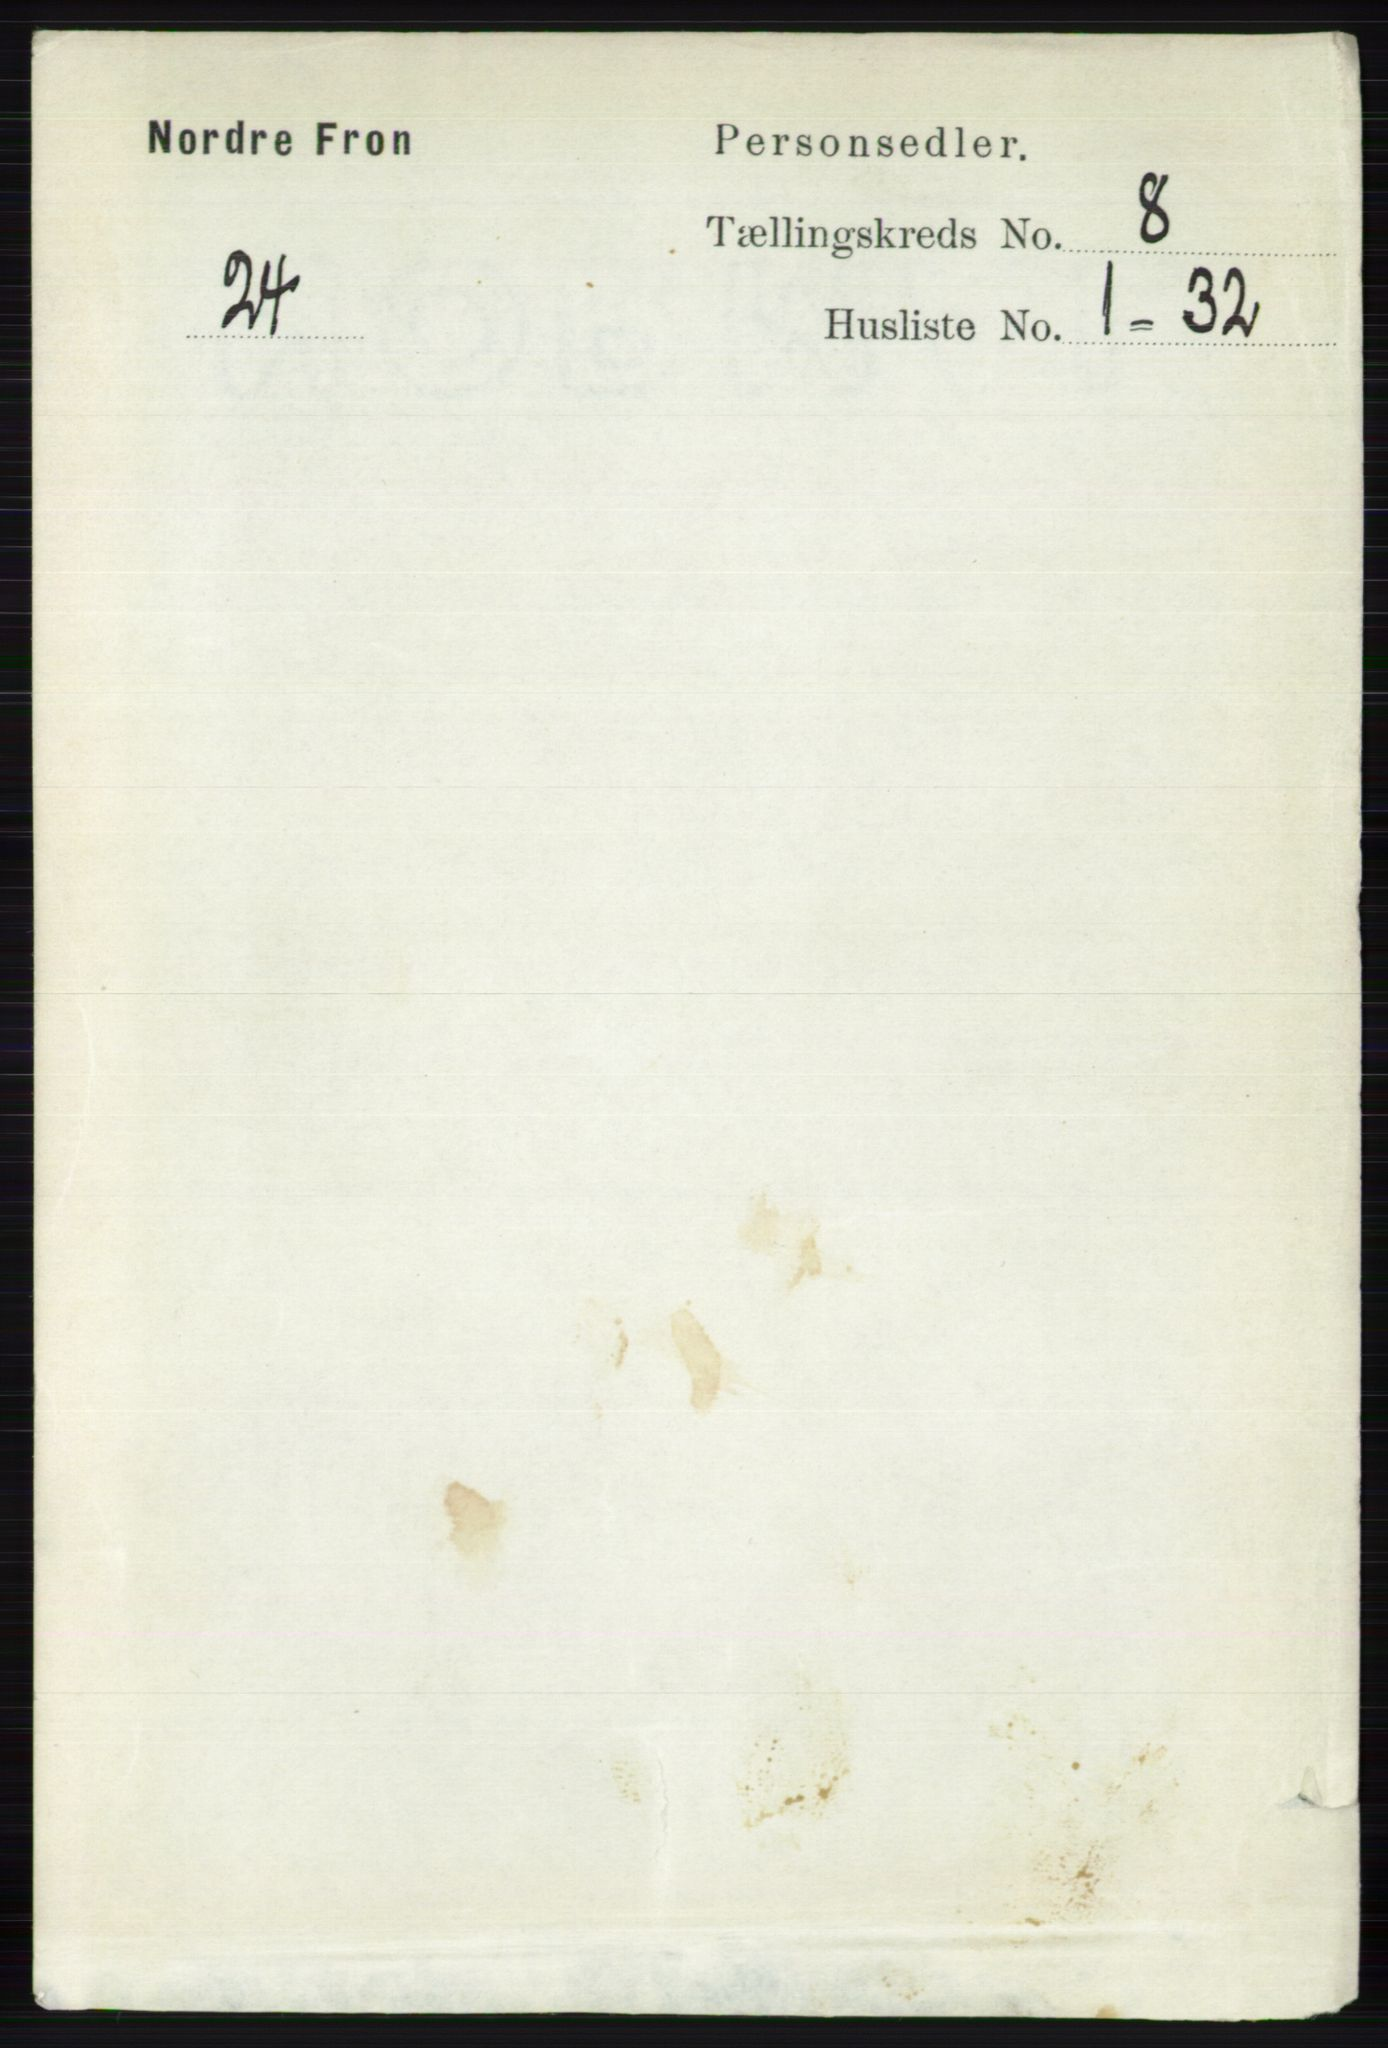 RA, Folketelling 1891 for 0518 Nord-Fron herred, 1891, s. 3420